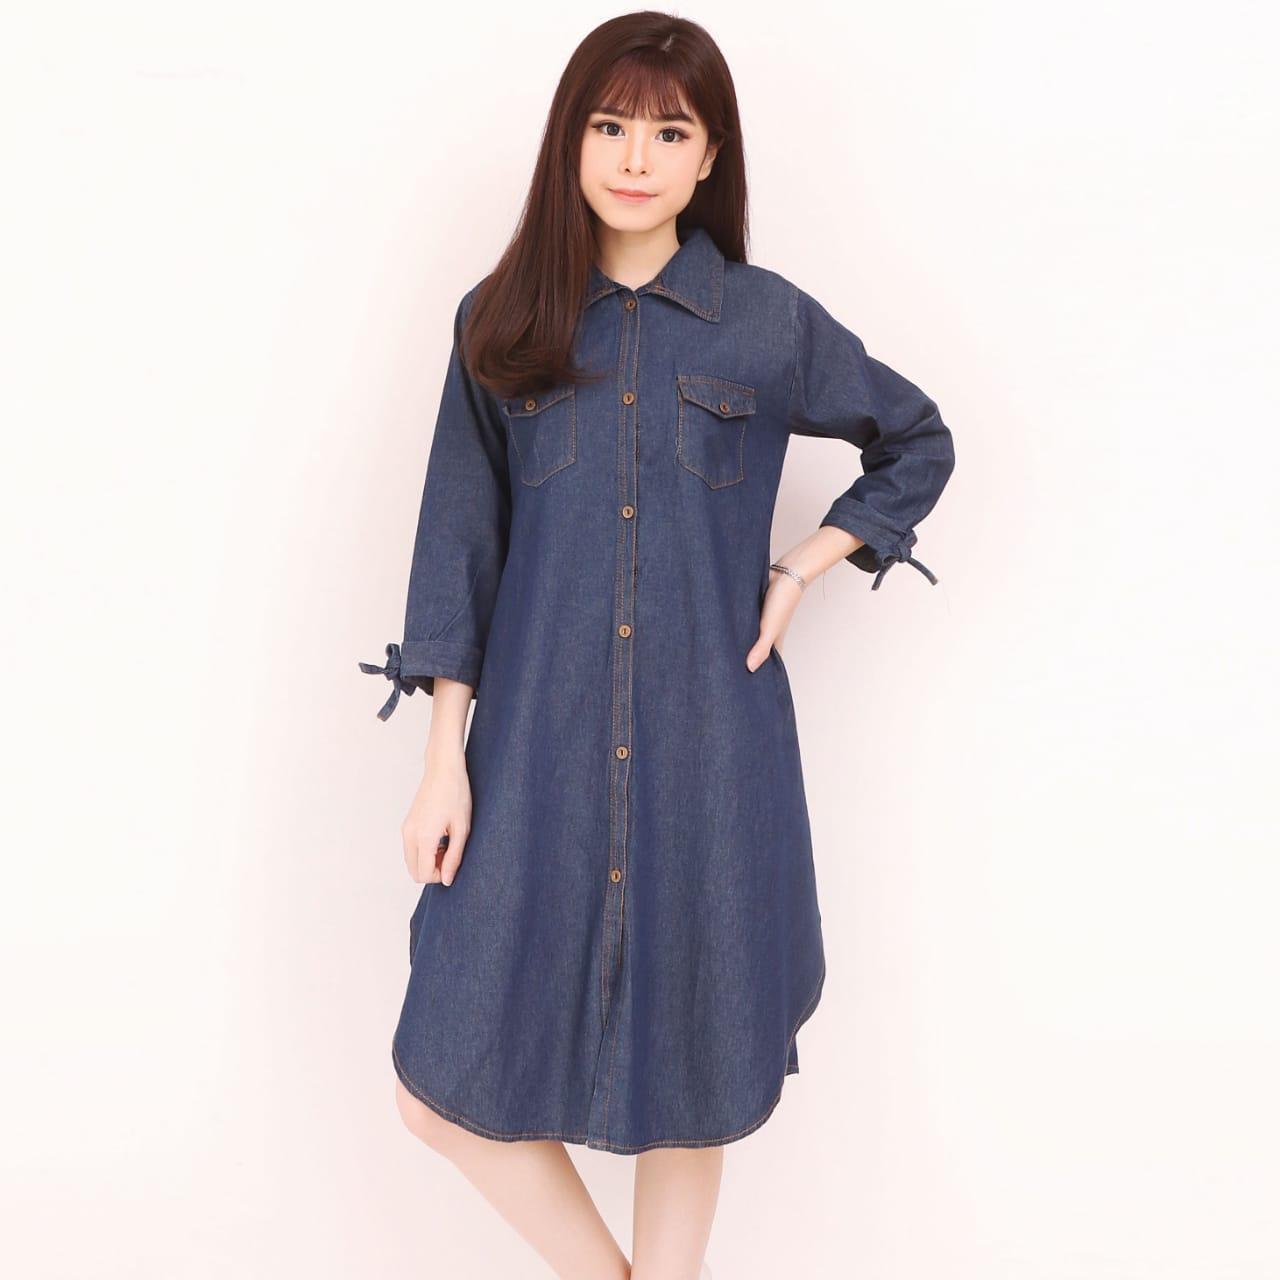 Harga SB Cillection Atasan Blouse Babydoll Jeans Kemeja Biru Muda Source · Cj collection Atasan blouse kemeja jeans wanita jumbo shirt SyuanaIDR100800 Rp ...